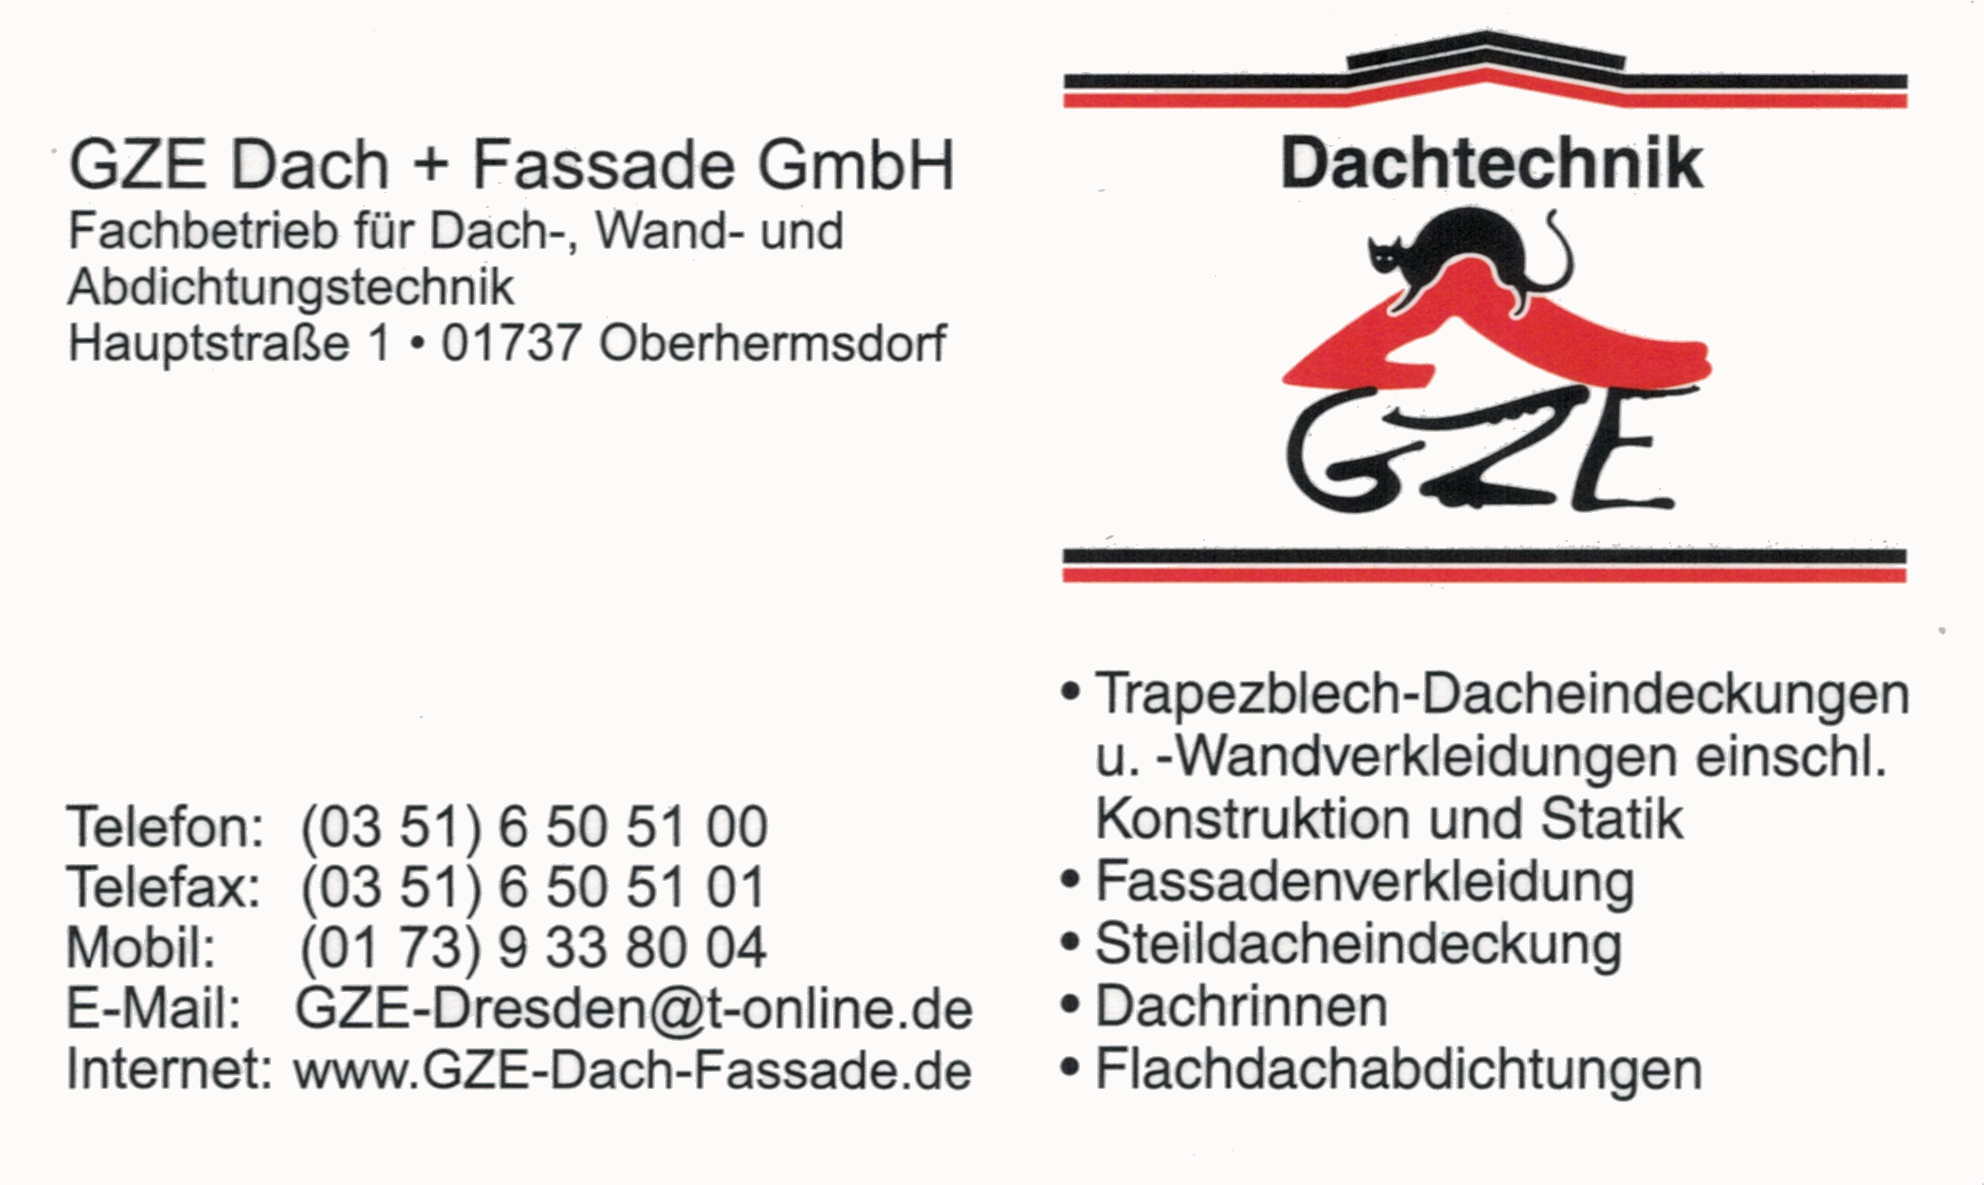 27-GZE-Dachtechnik